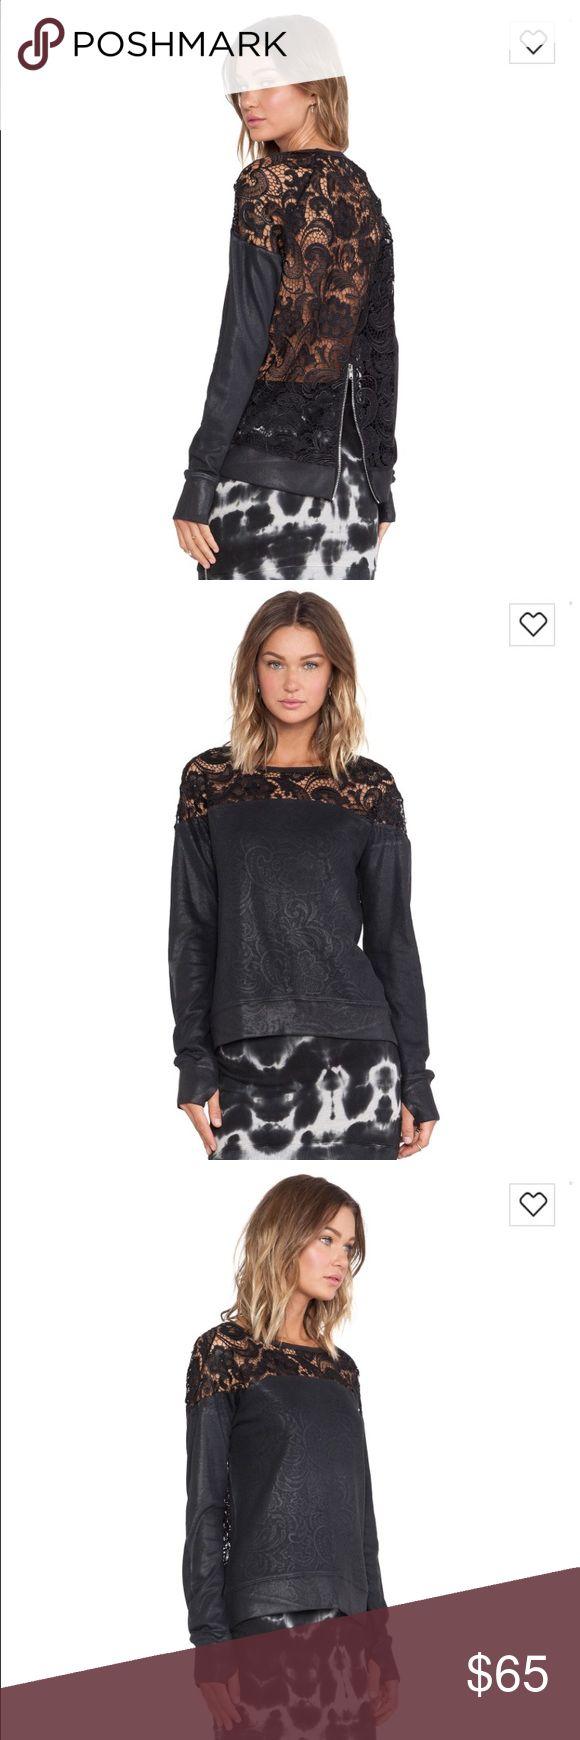 New! Pam & Gela coated lace sweatshirt New! Pam & Gela coated lace sweatshirt -flawless! pam & gela Tops Sweatshirts & Hoodies